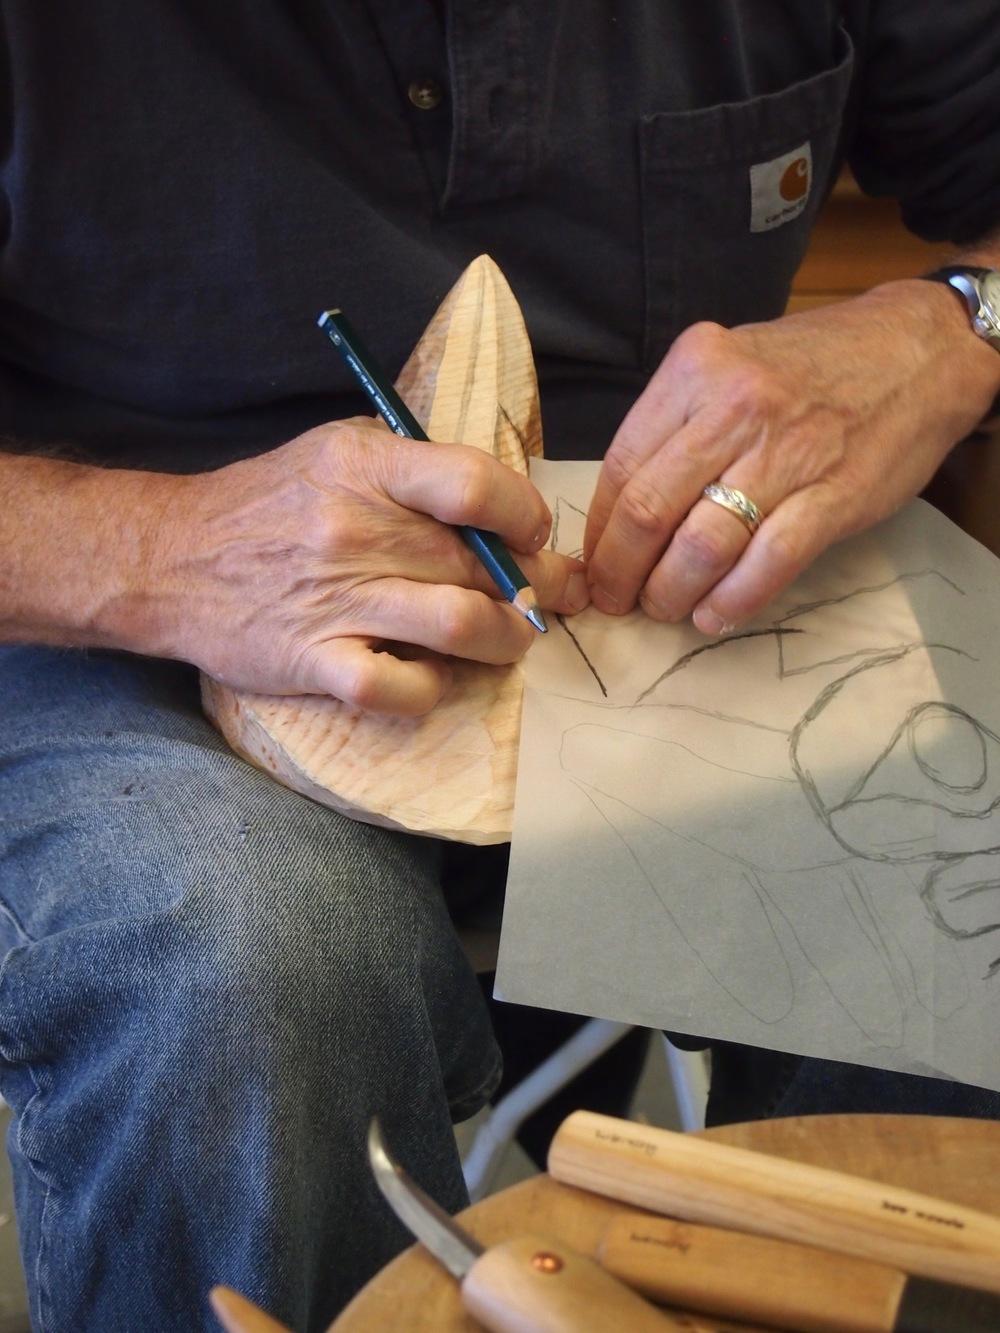 Tlingit Mask Carving Steve Brown760.jpg